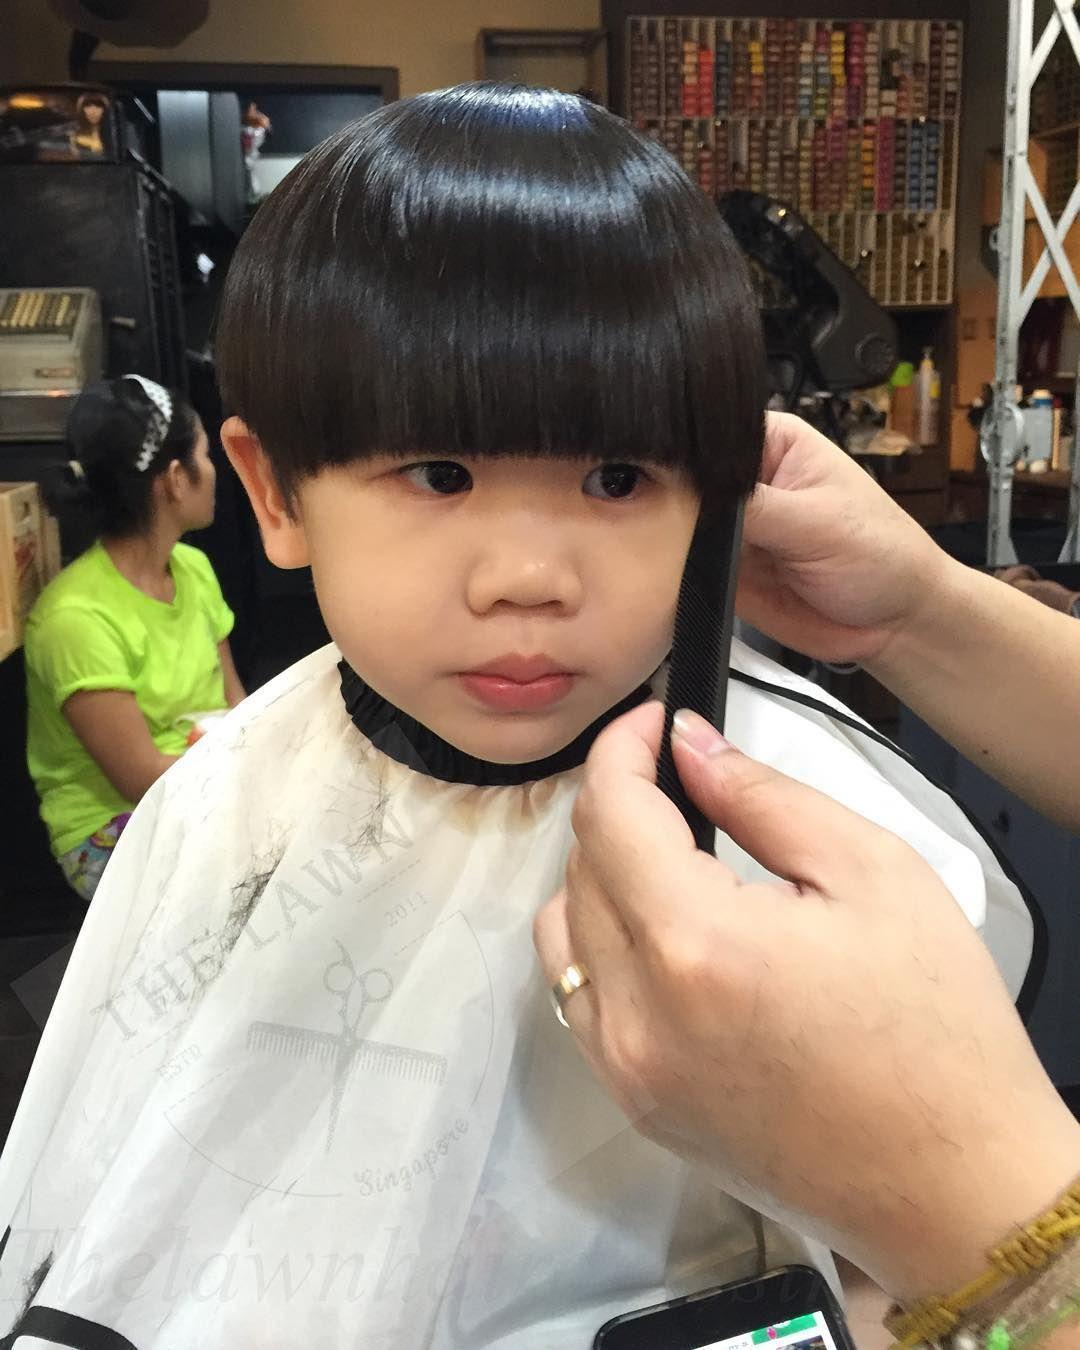 Koreanische Frisuren Fur Jungen Kinder Jungen Frisuren Kinder Koreanisch Nicehairstylesfor In 2020 Frisuren Fur Kinder Jungen Jungs Frisuren Koreanische Frisuren